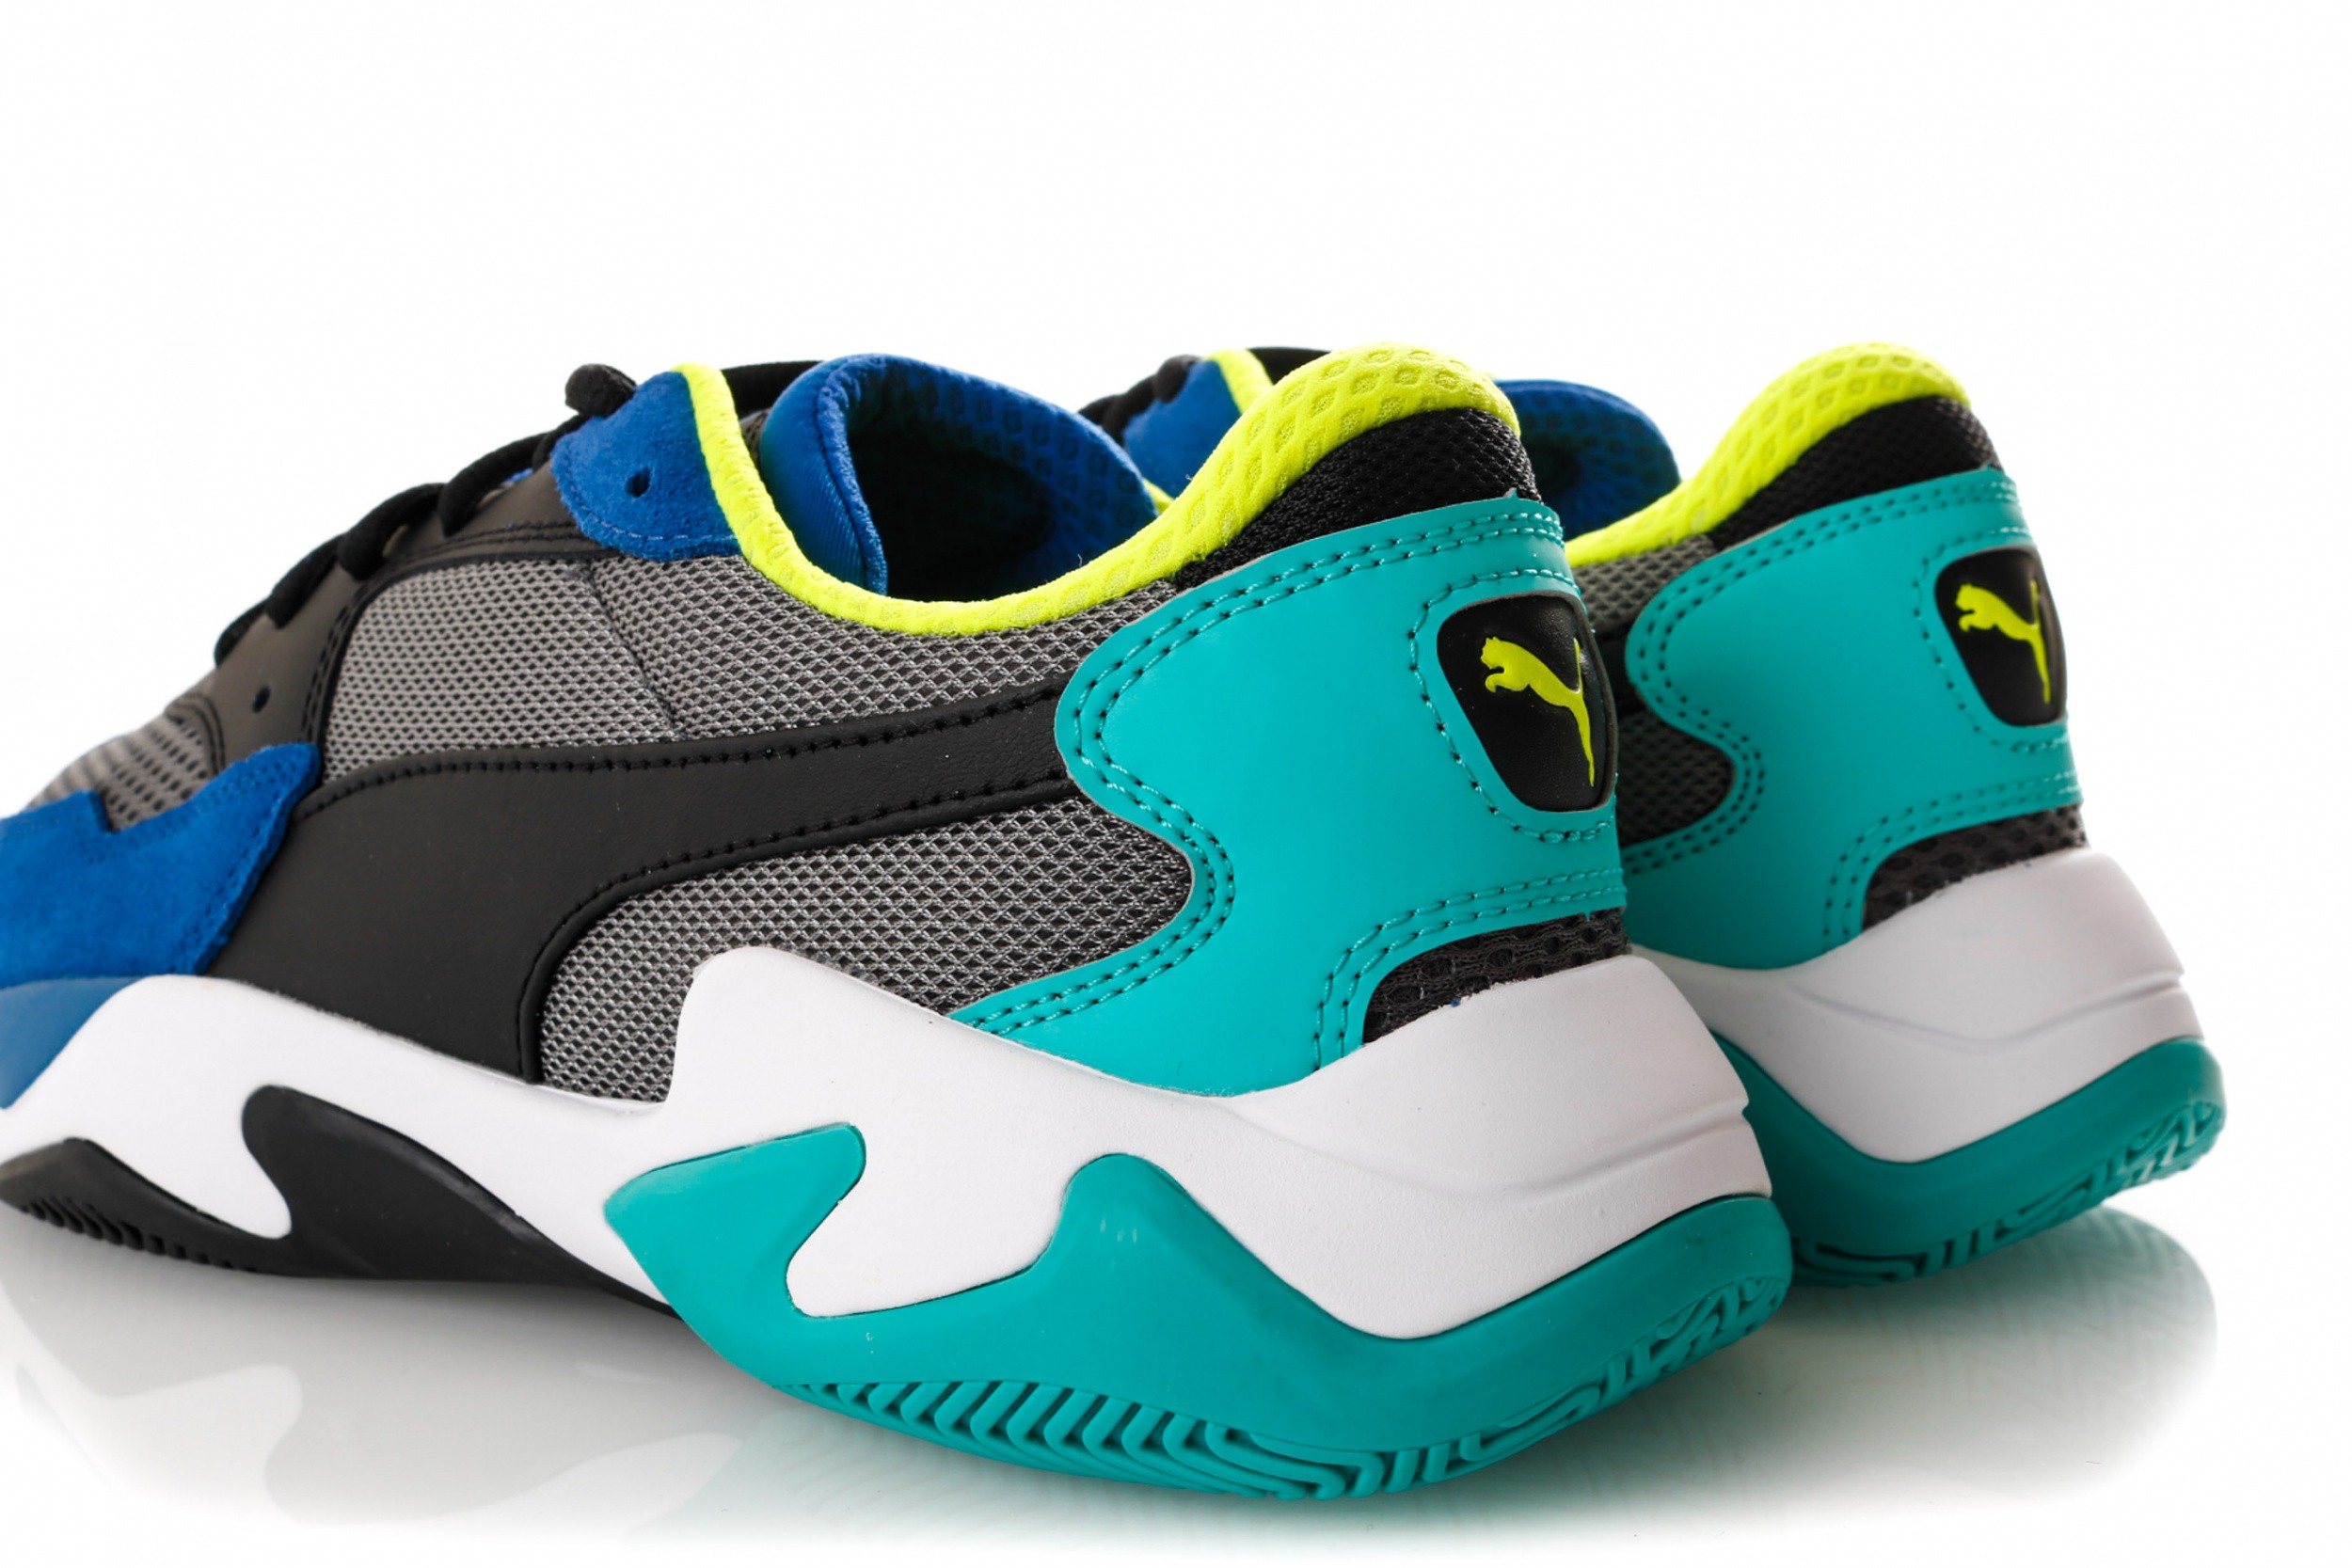 579b0dee685 Afbeelding van Puma STORM ORIGIN 369770 01 Sneakers galaxy blue-castlerock